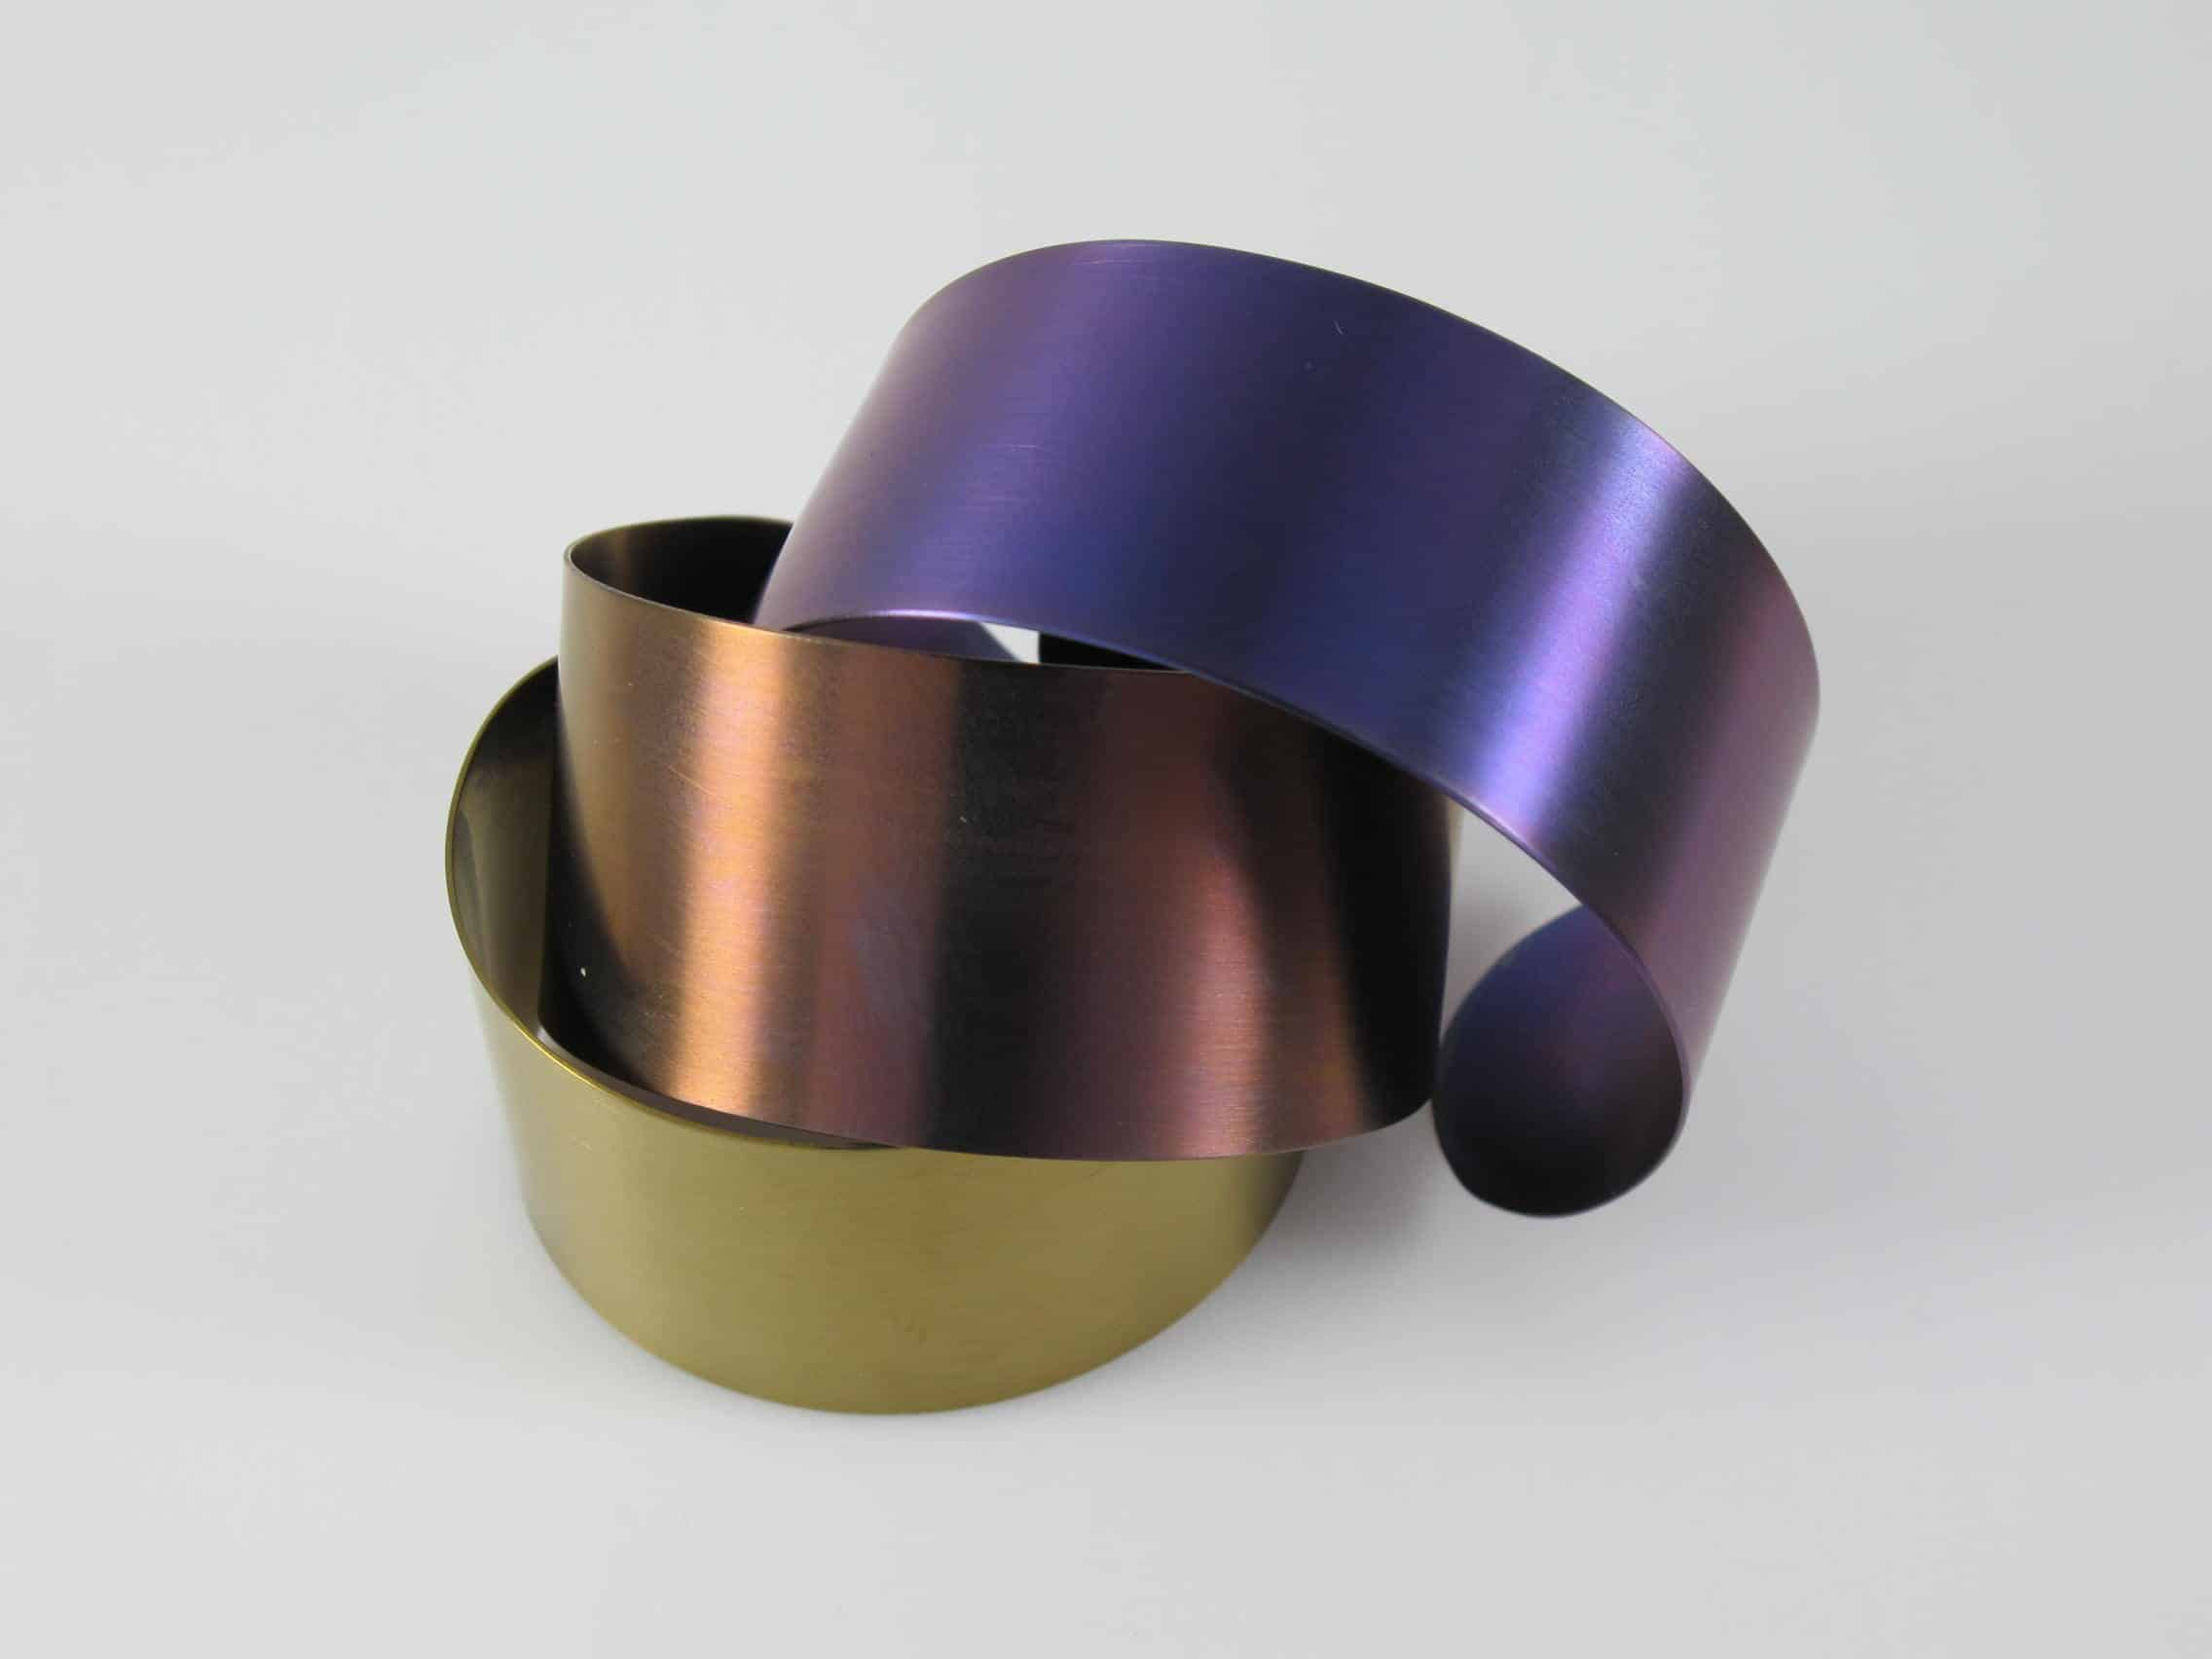 spangarmband-gekleurd2_4589-kopie